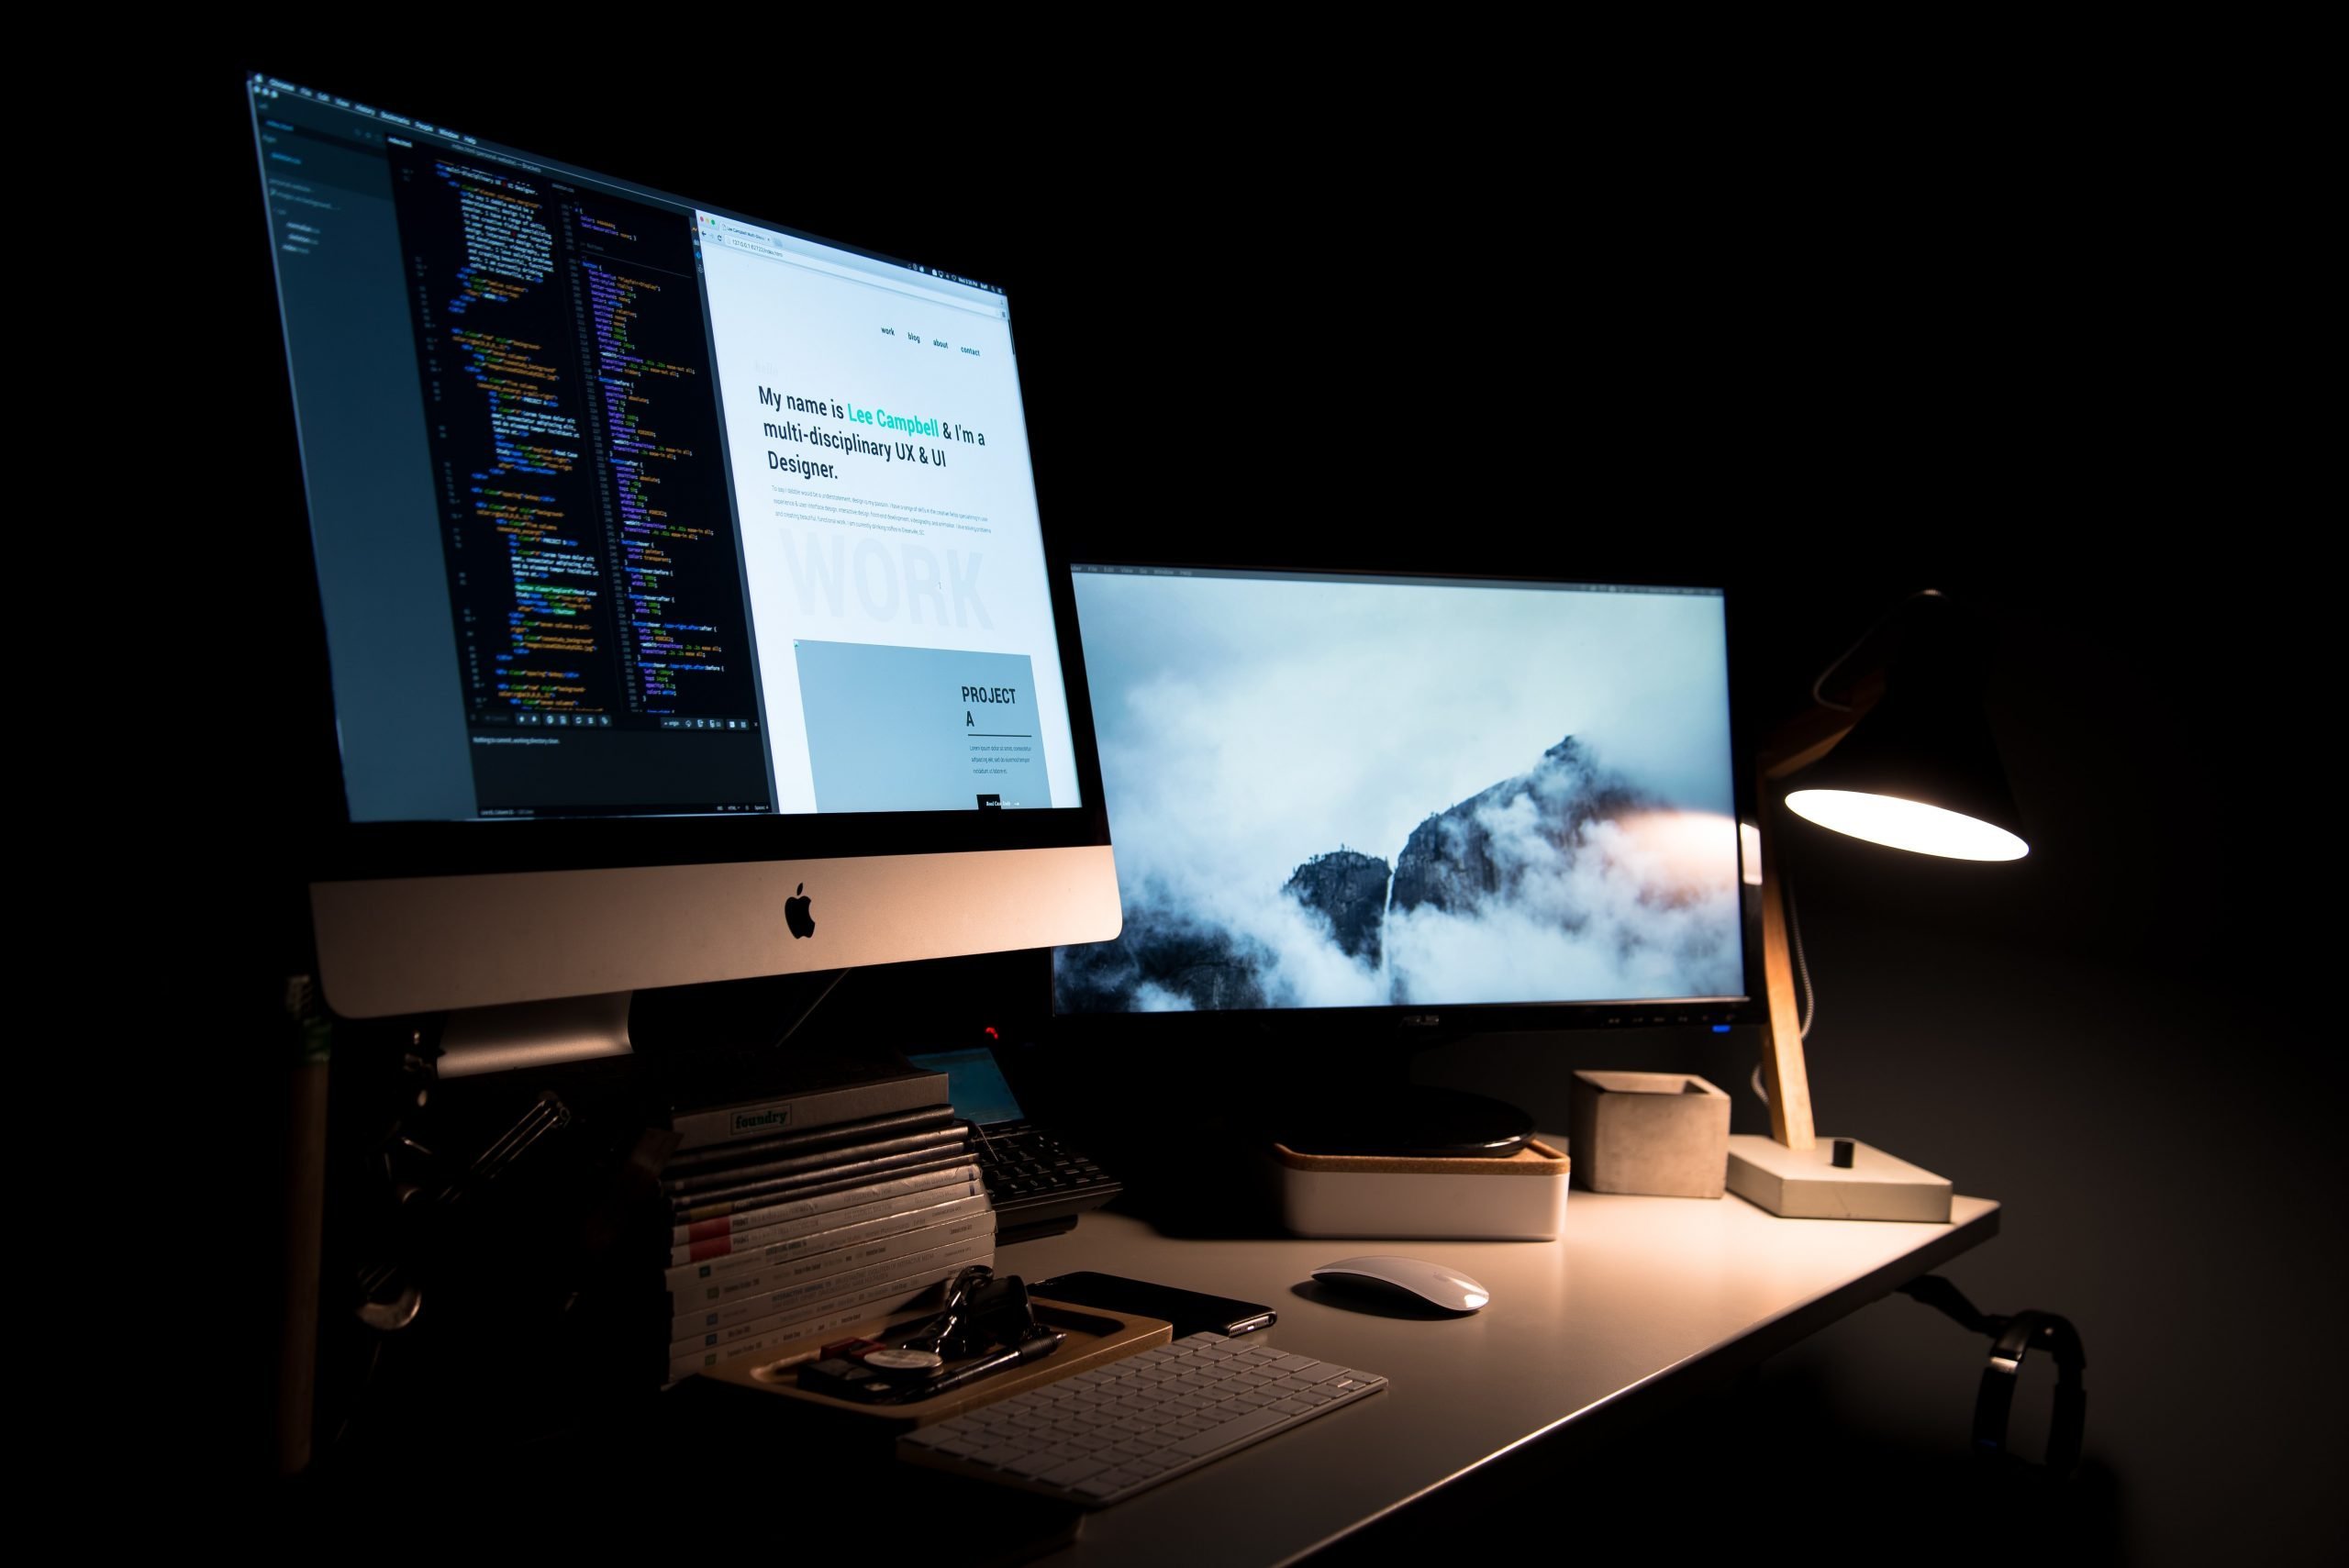 Two desktops working on web design